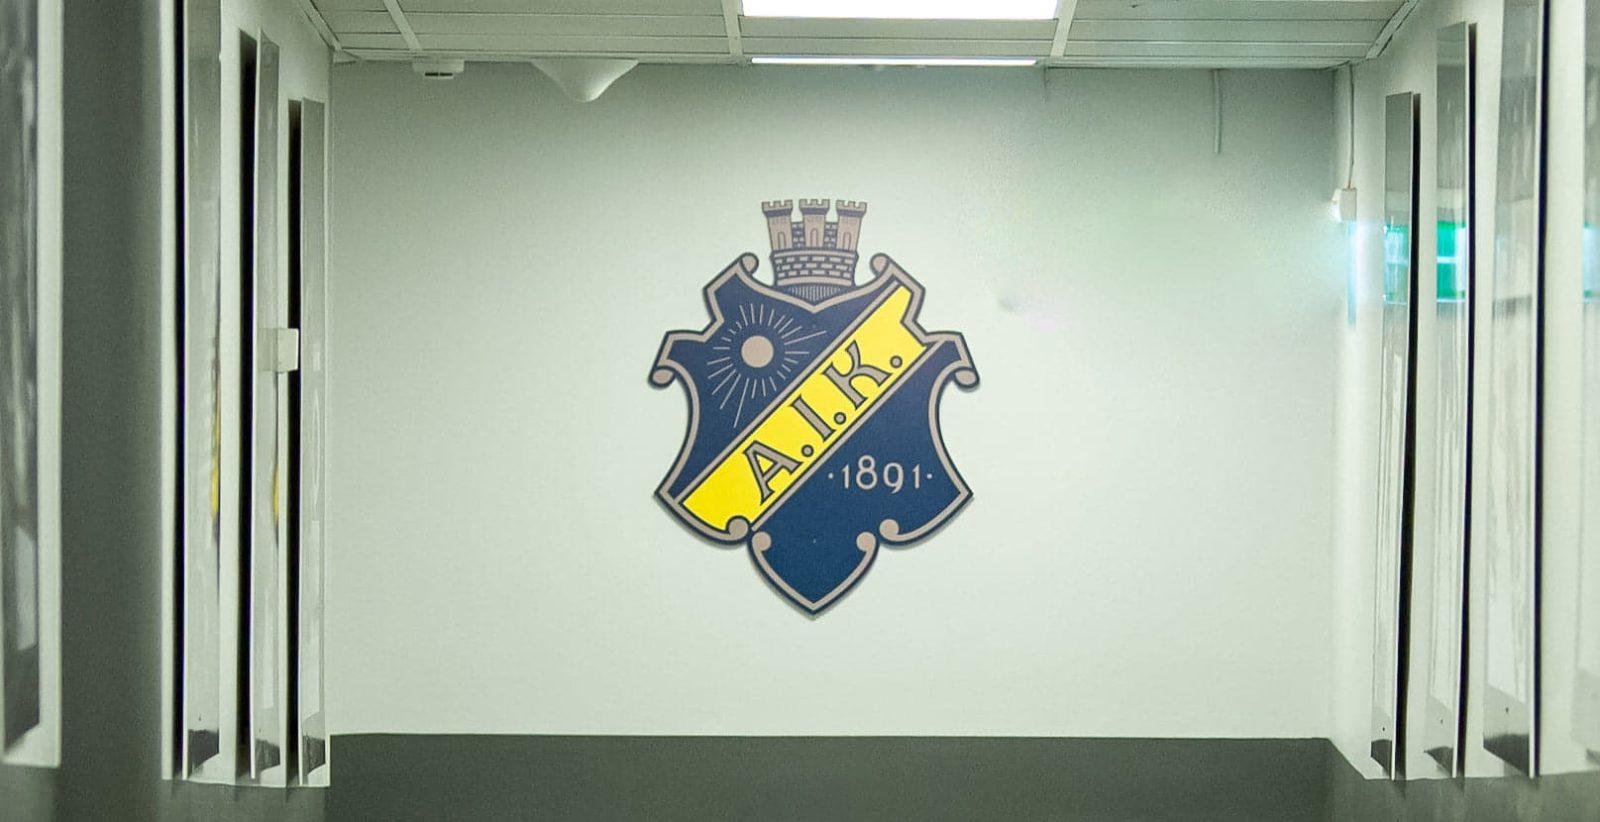 PUBLIKEN: AIK:s fina gest i publikfrågan